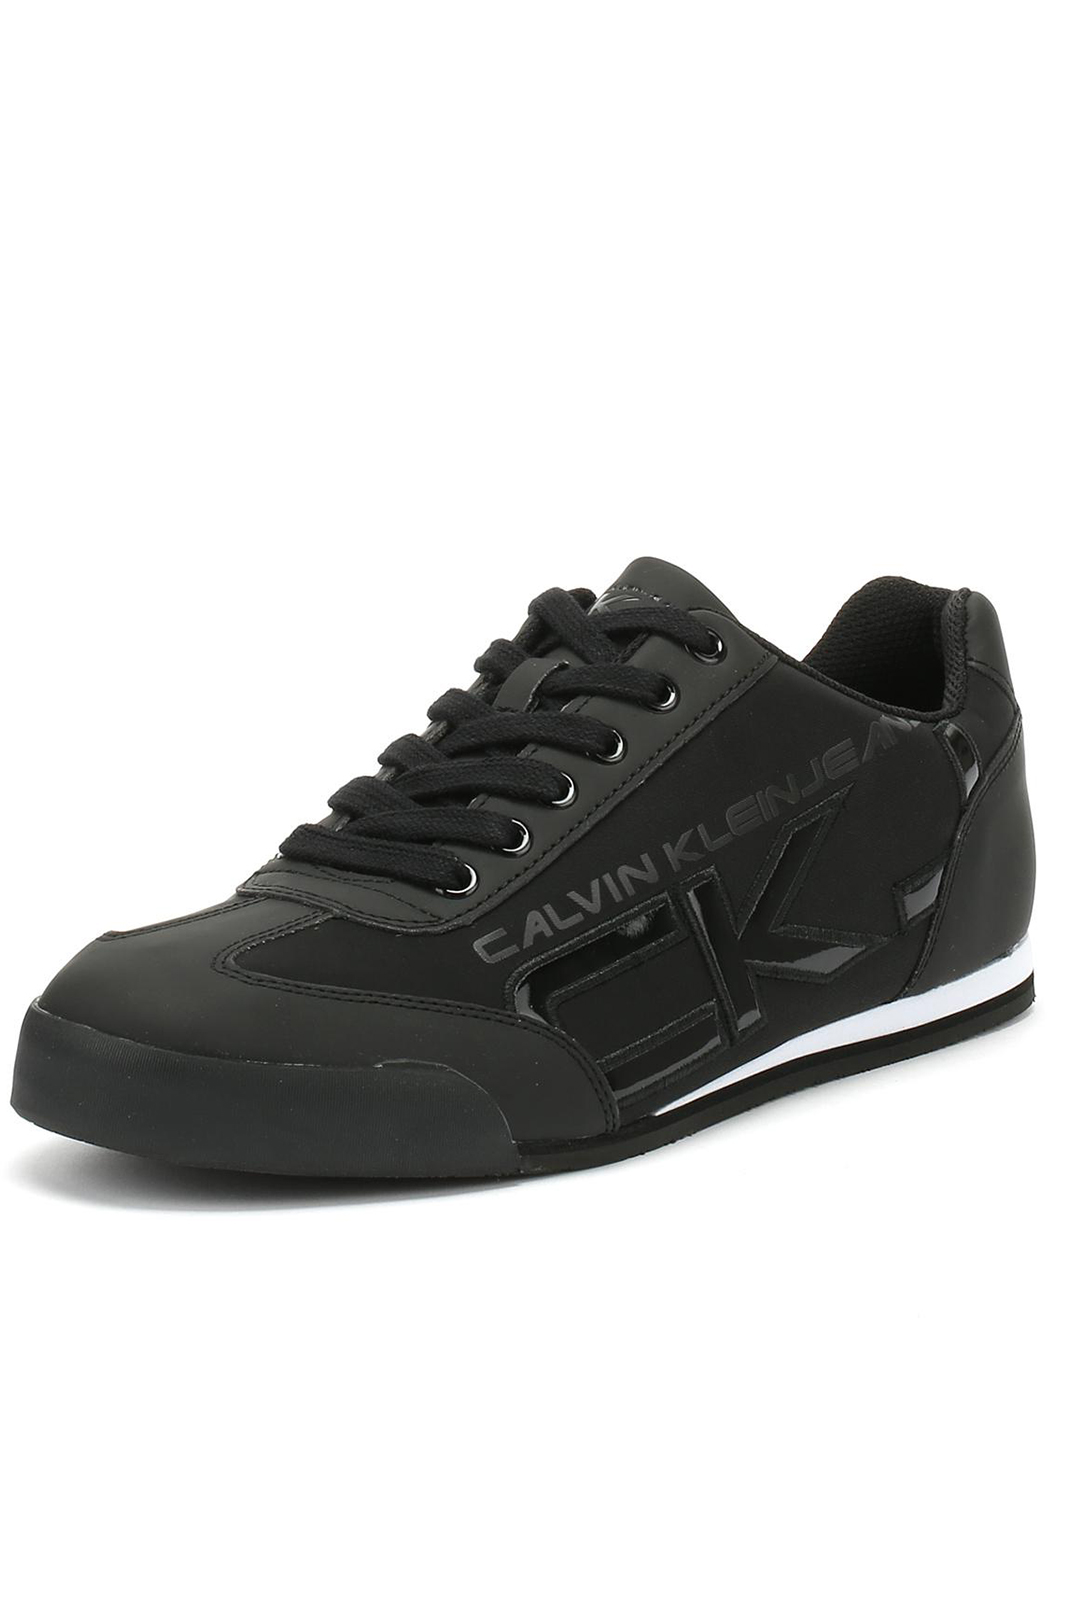 Baskets / Sport  Calvin klein CALE MATTE BLACK